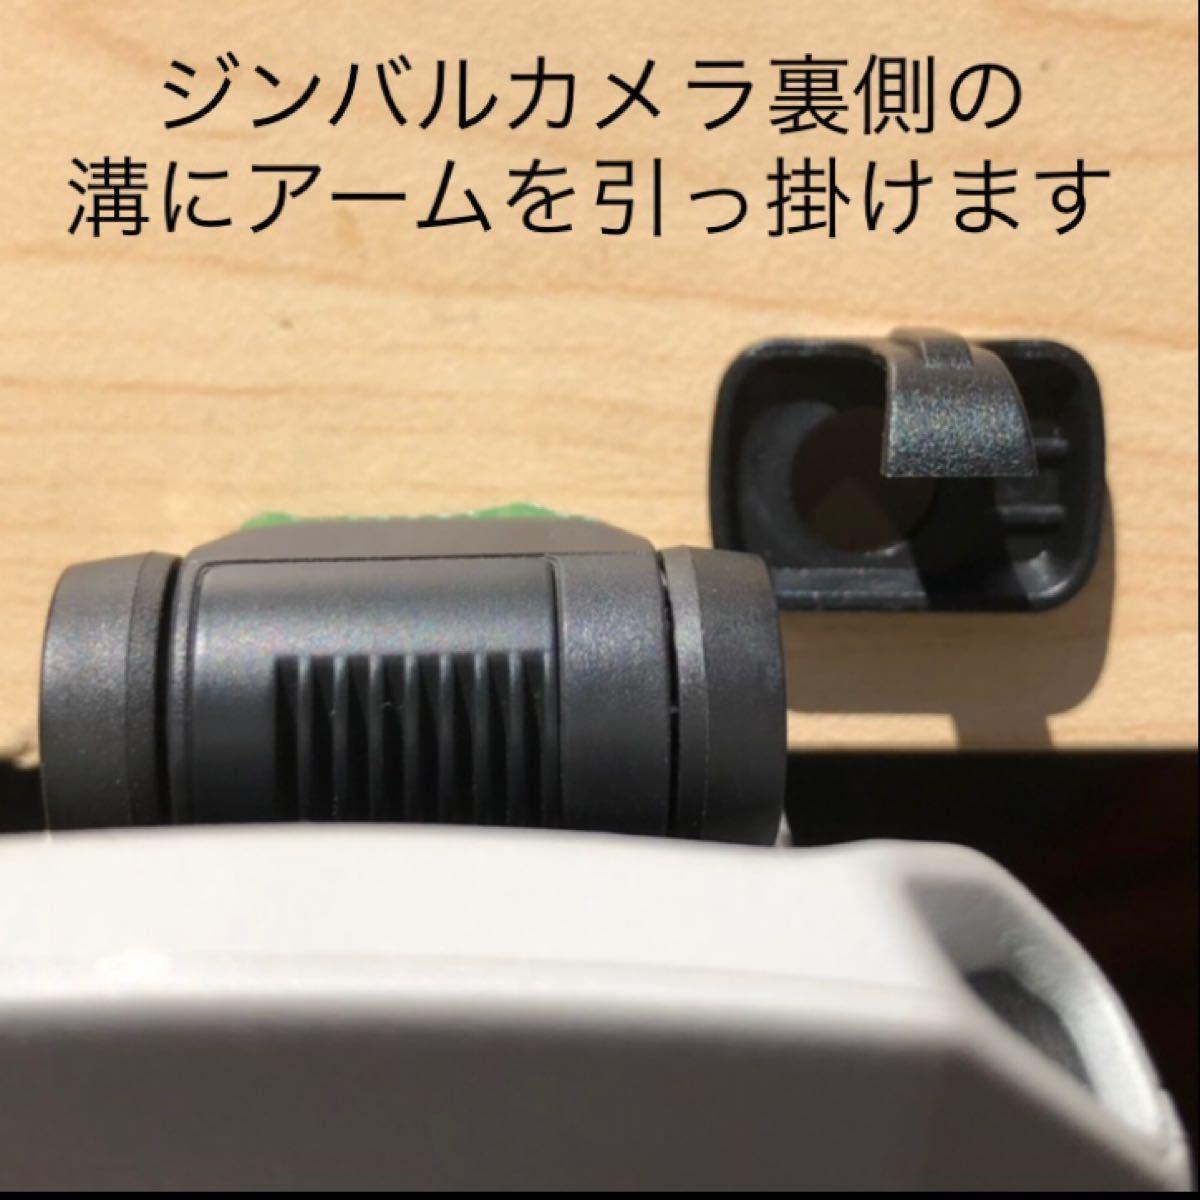 ☆CPL 偏光フィルタ ★DJI MINI 2 ★DJI Mavic Mini